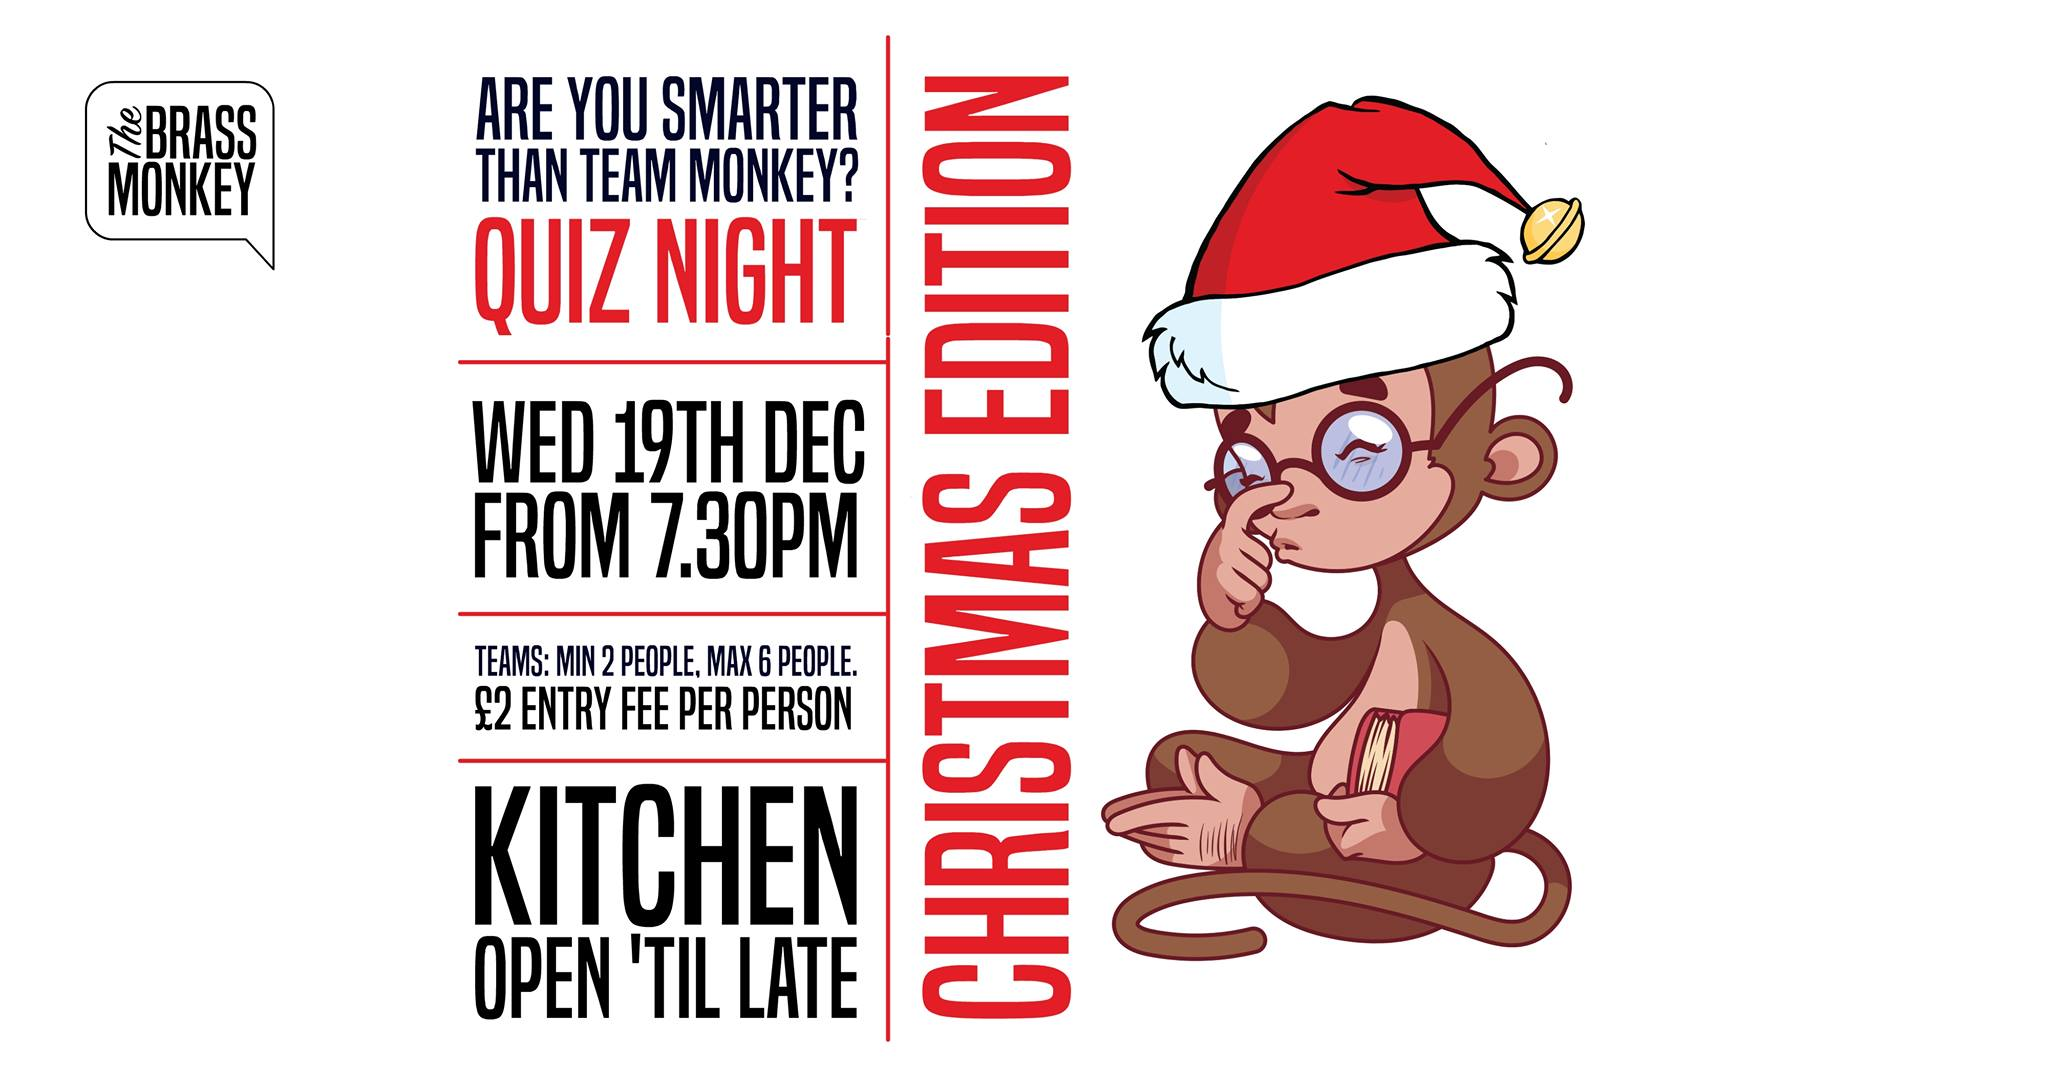 Quiz Night at the Brass Monkey